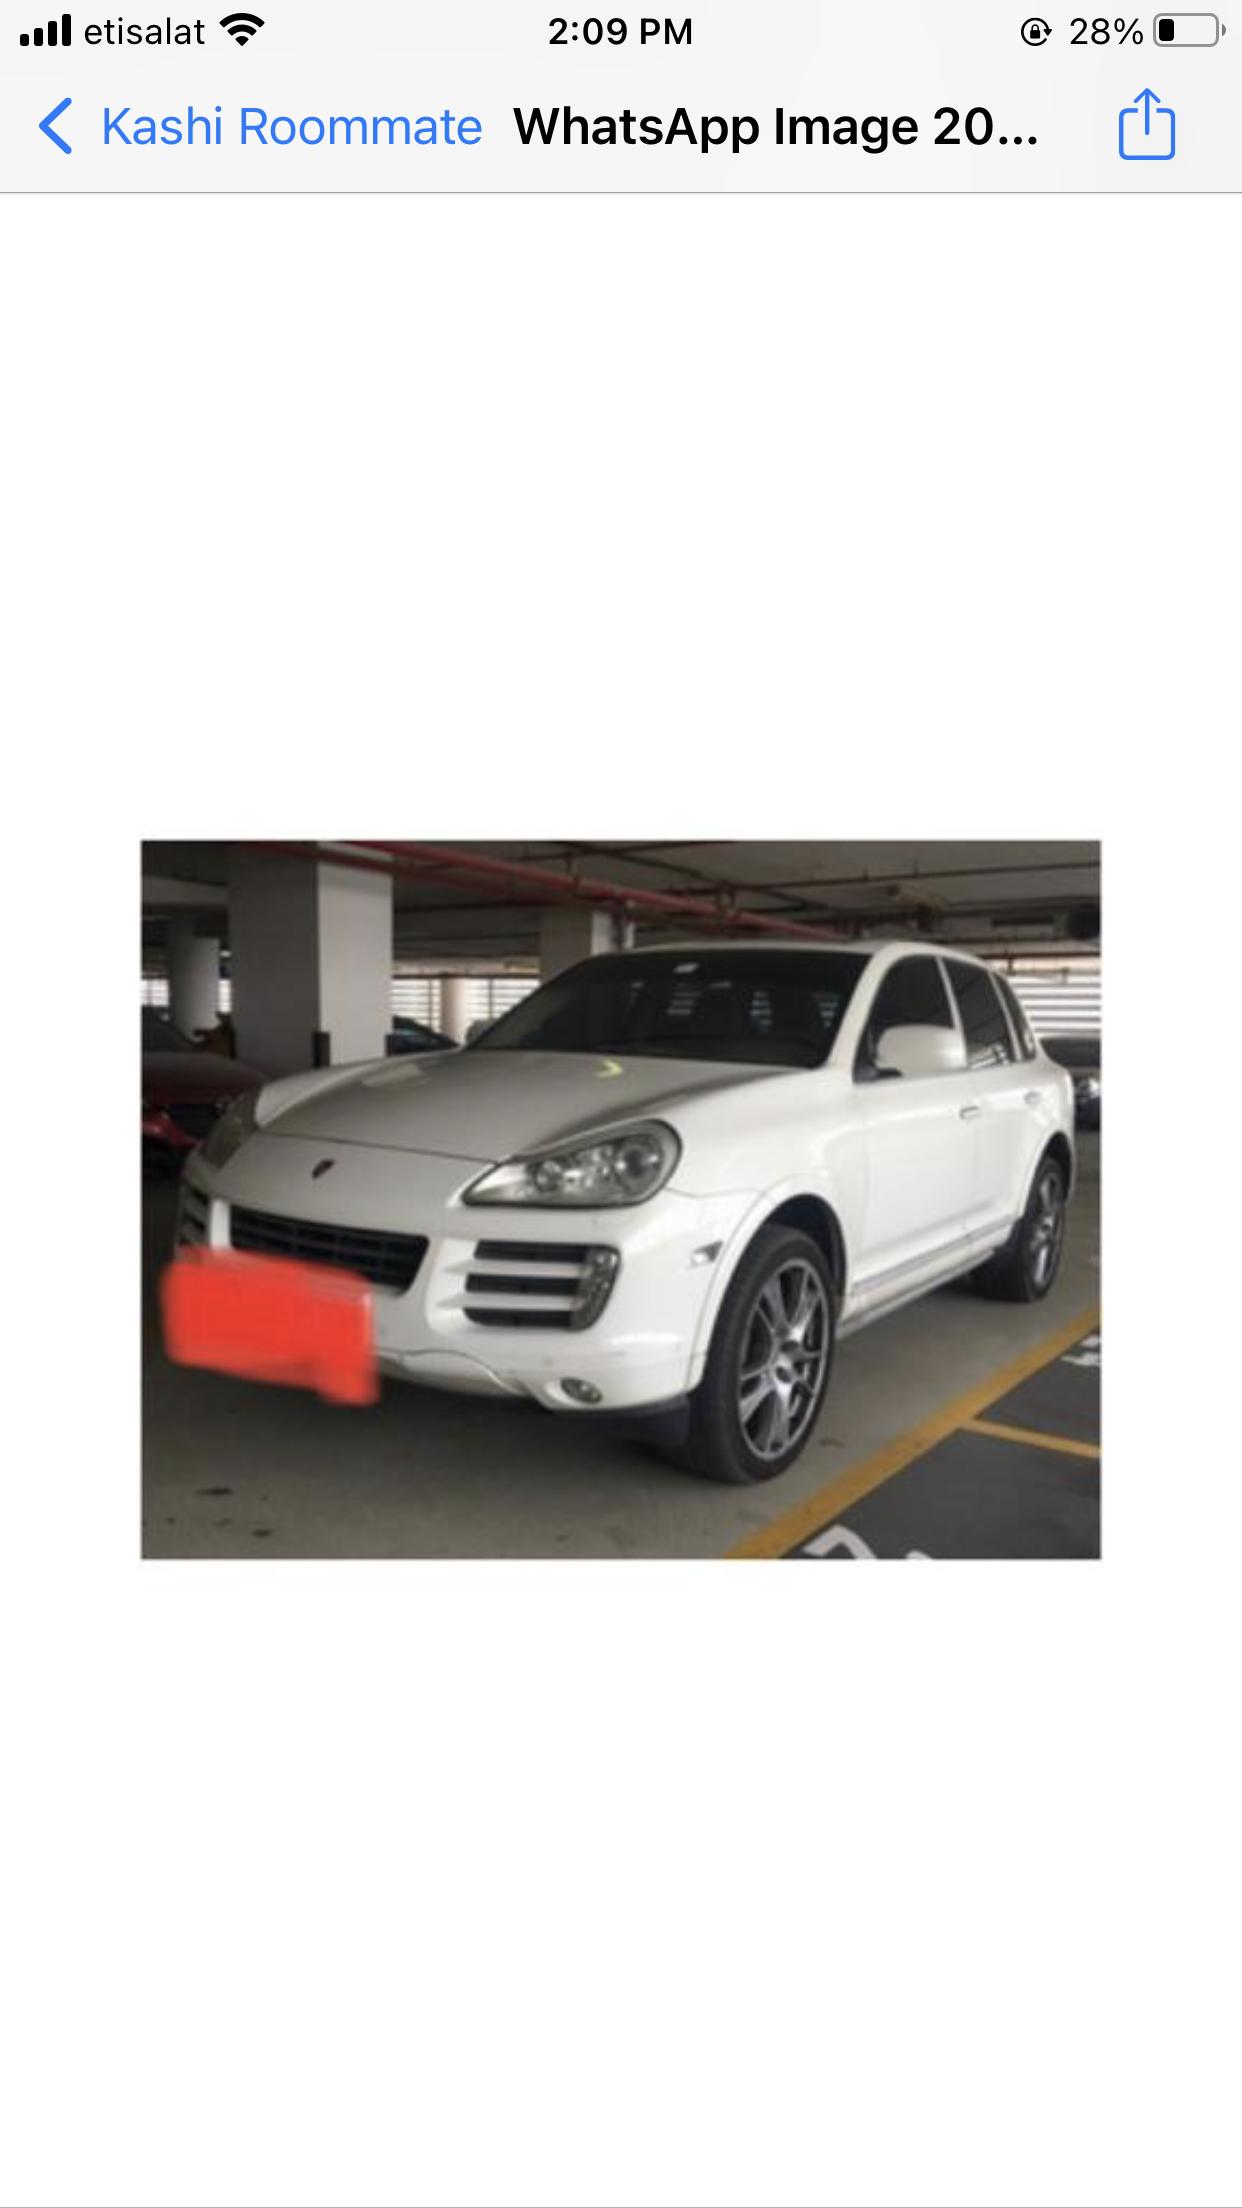 Porsche Cayenne S for sale no accident white color - Image 4